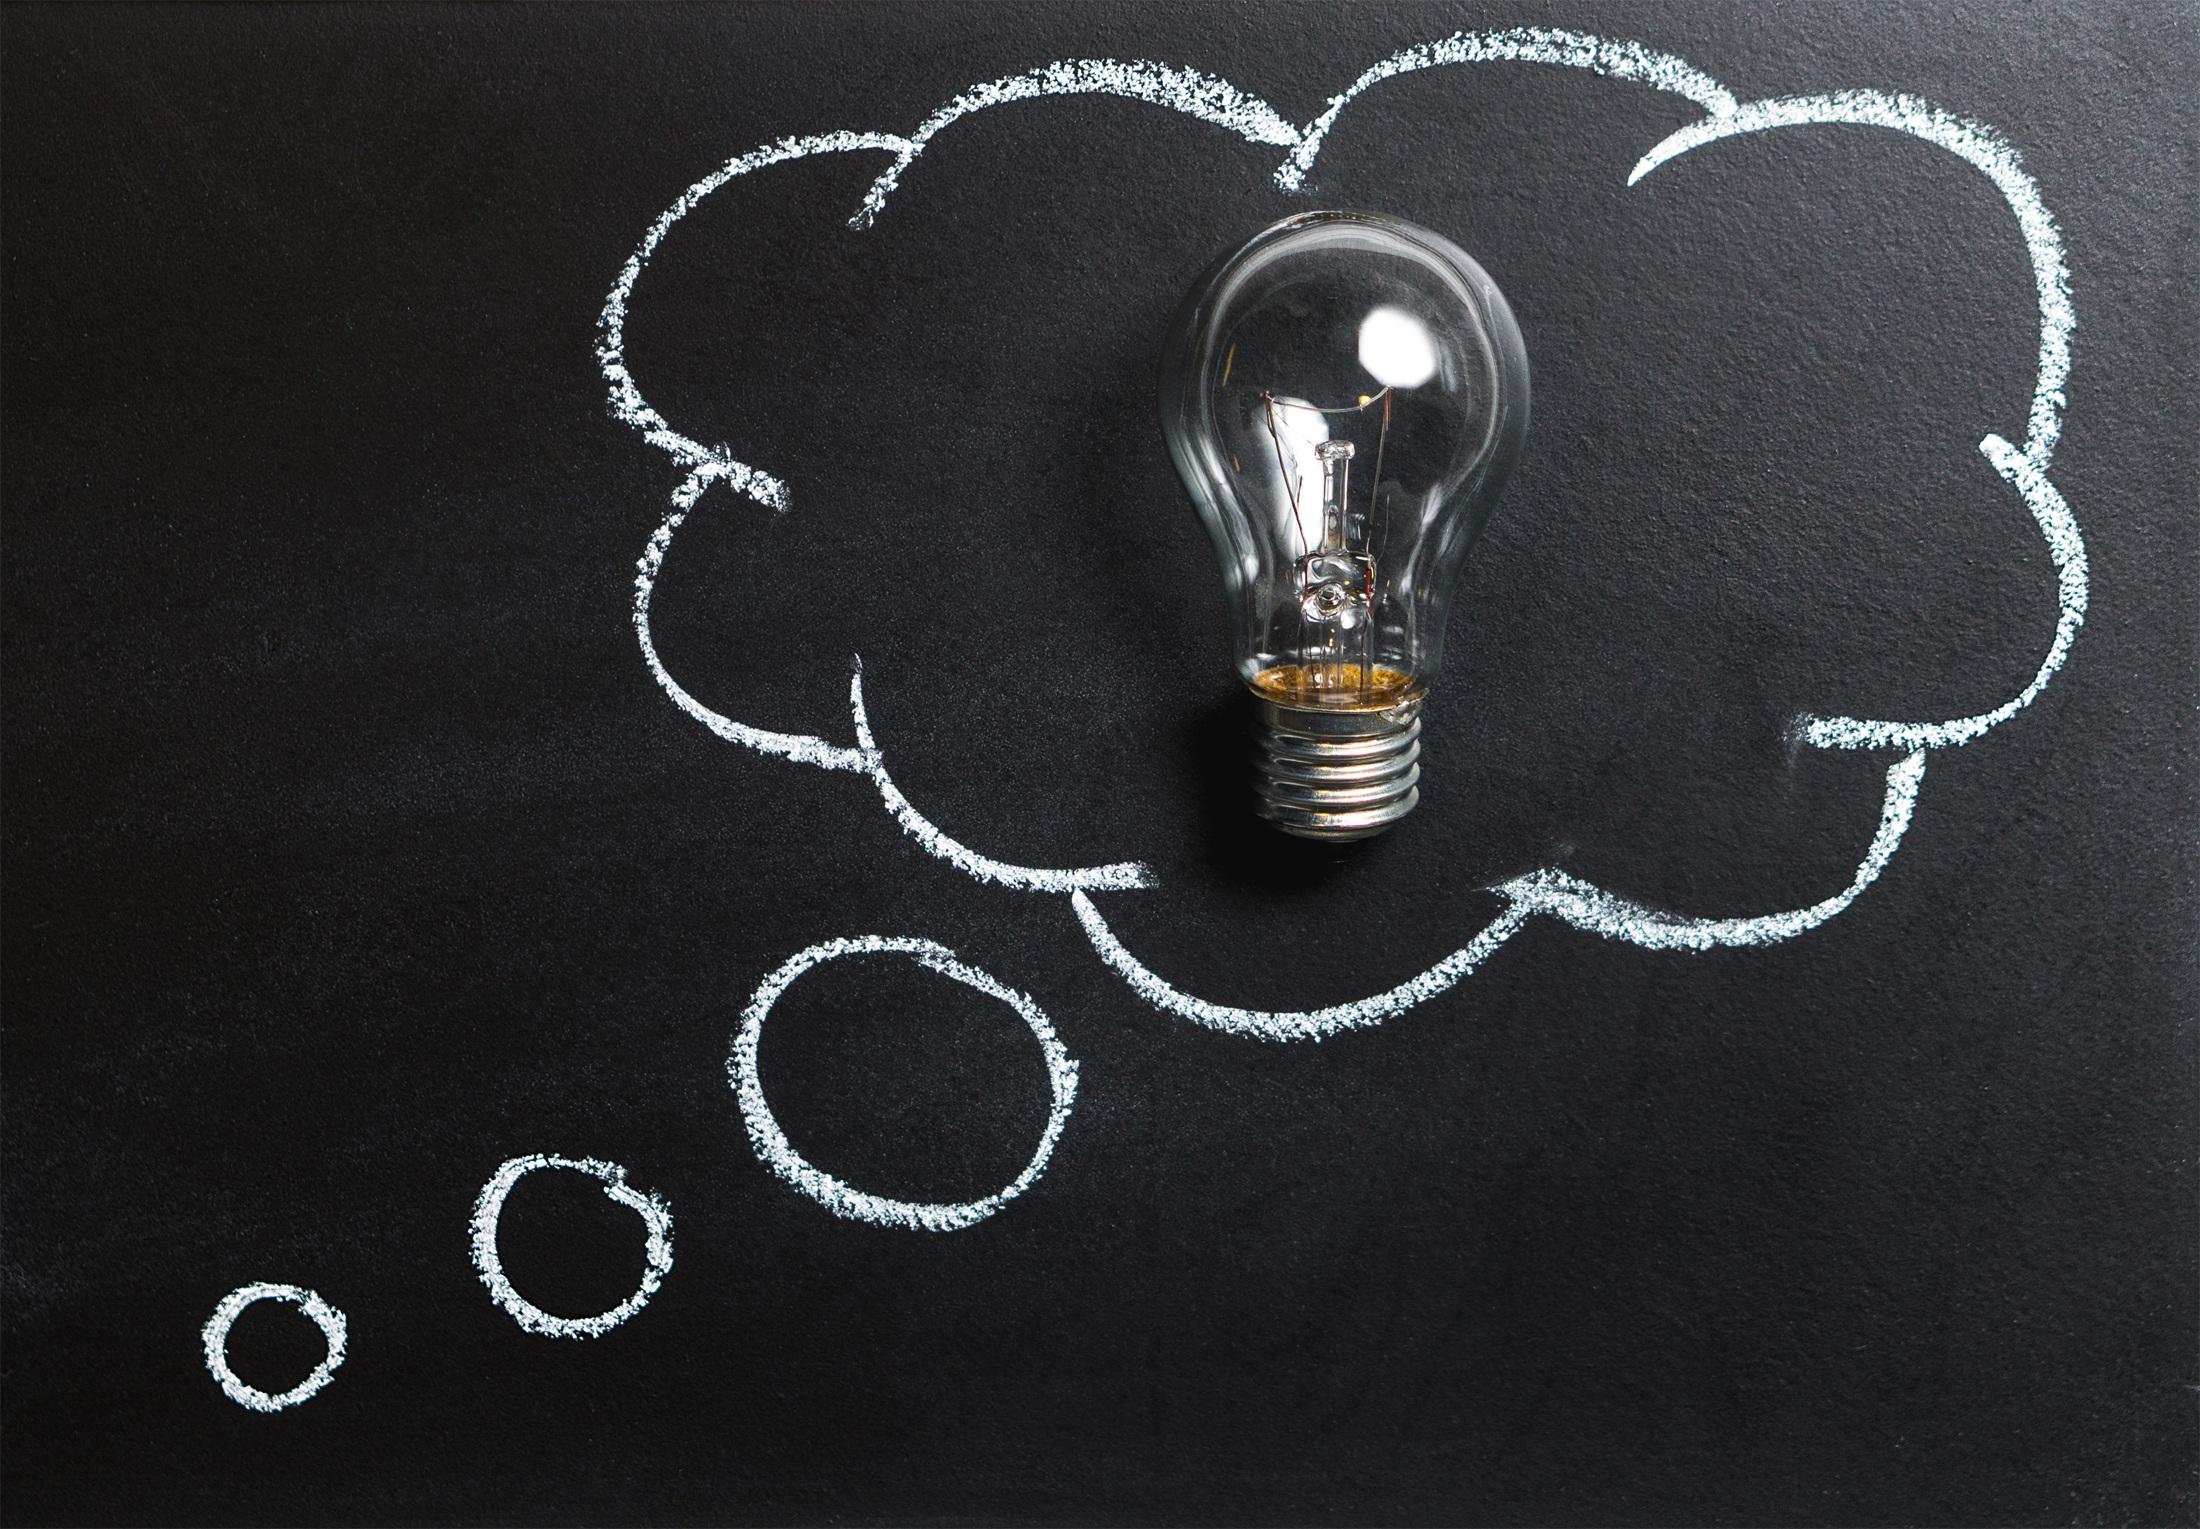 Canva - Clear Light Bulb Placed on Chalkboard.jpg